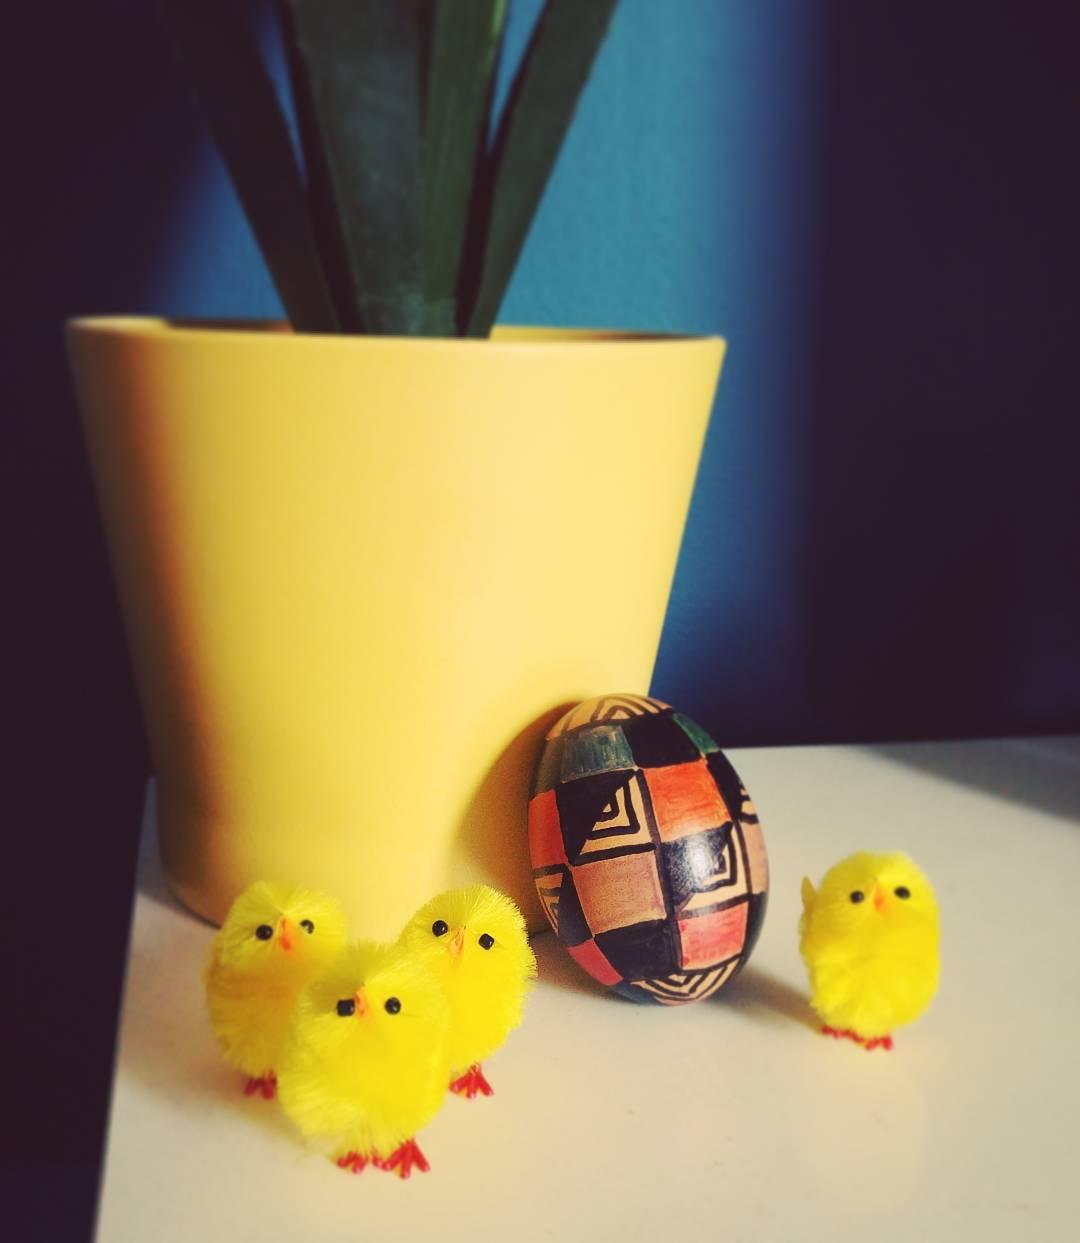 Check Art Decor On Egg